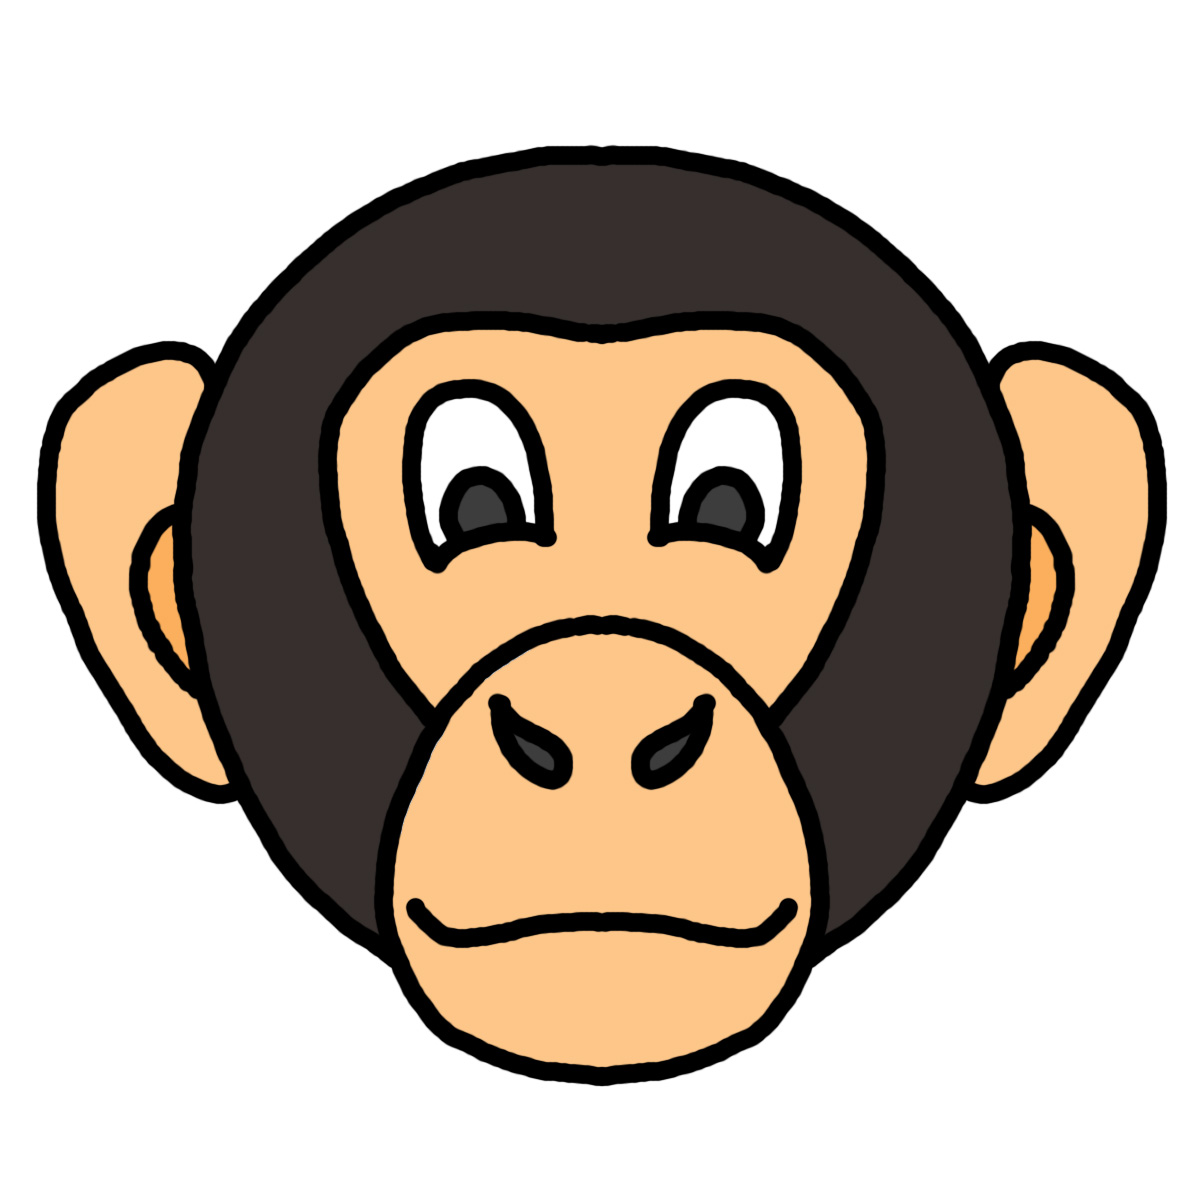 Animasi Kartun Orangutan